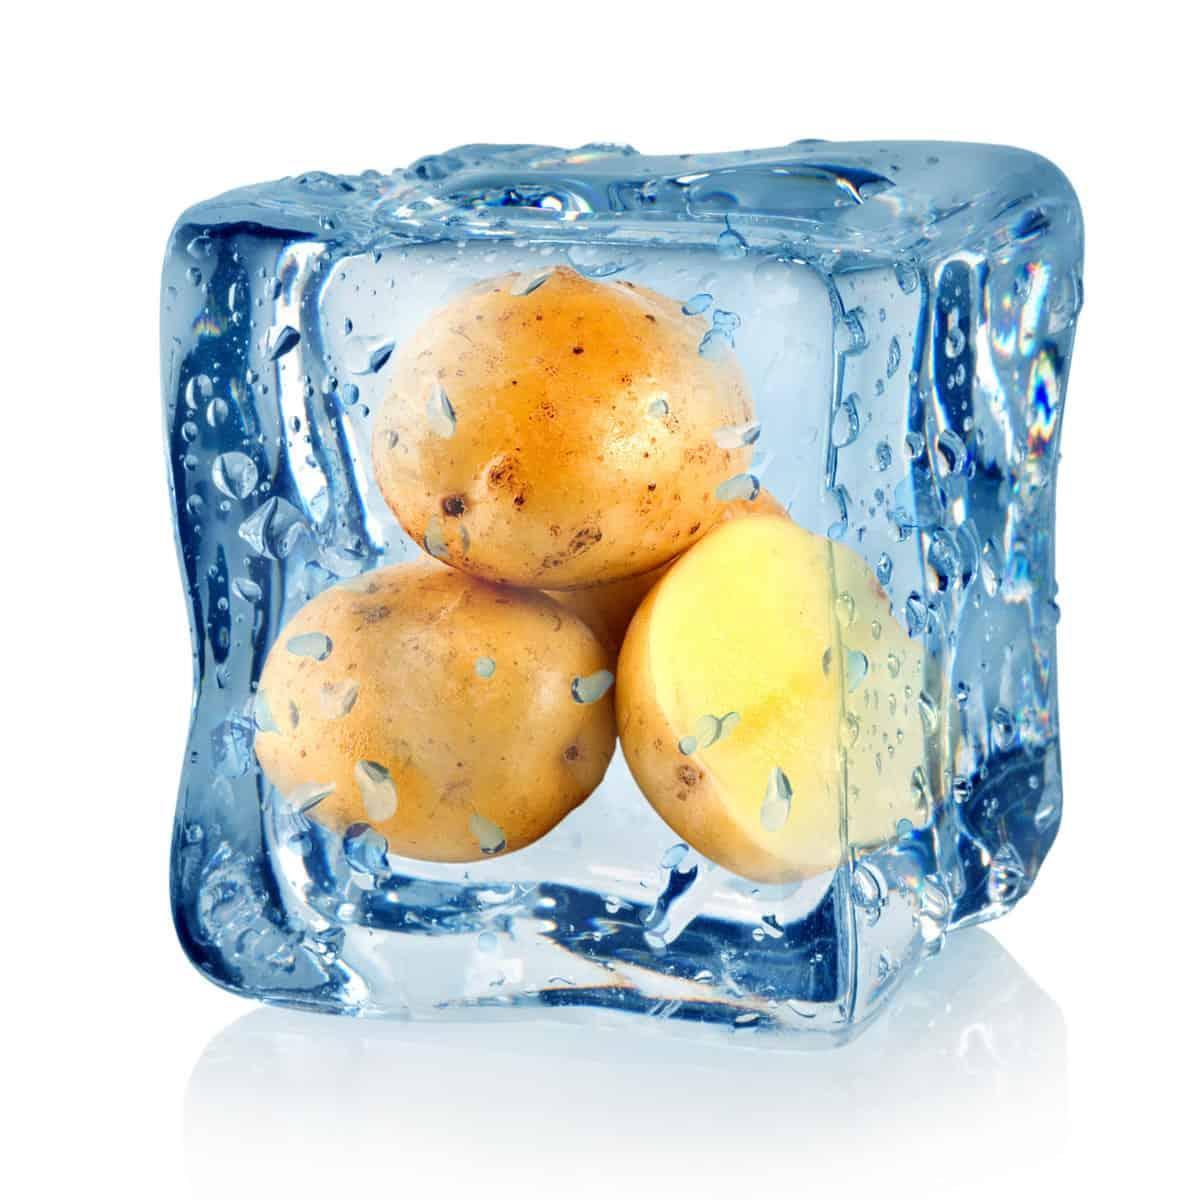 Potatoes inside an ice cube